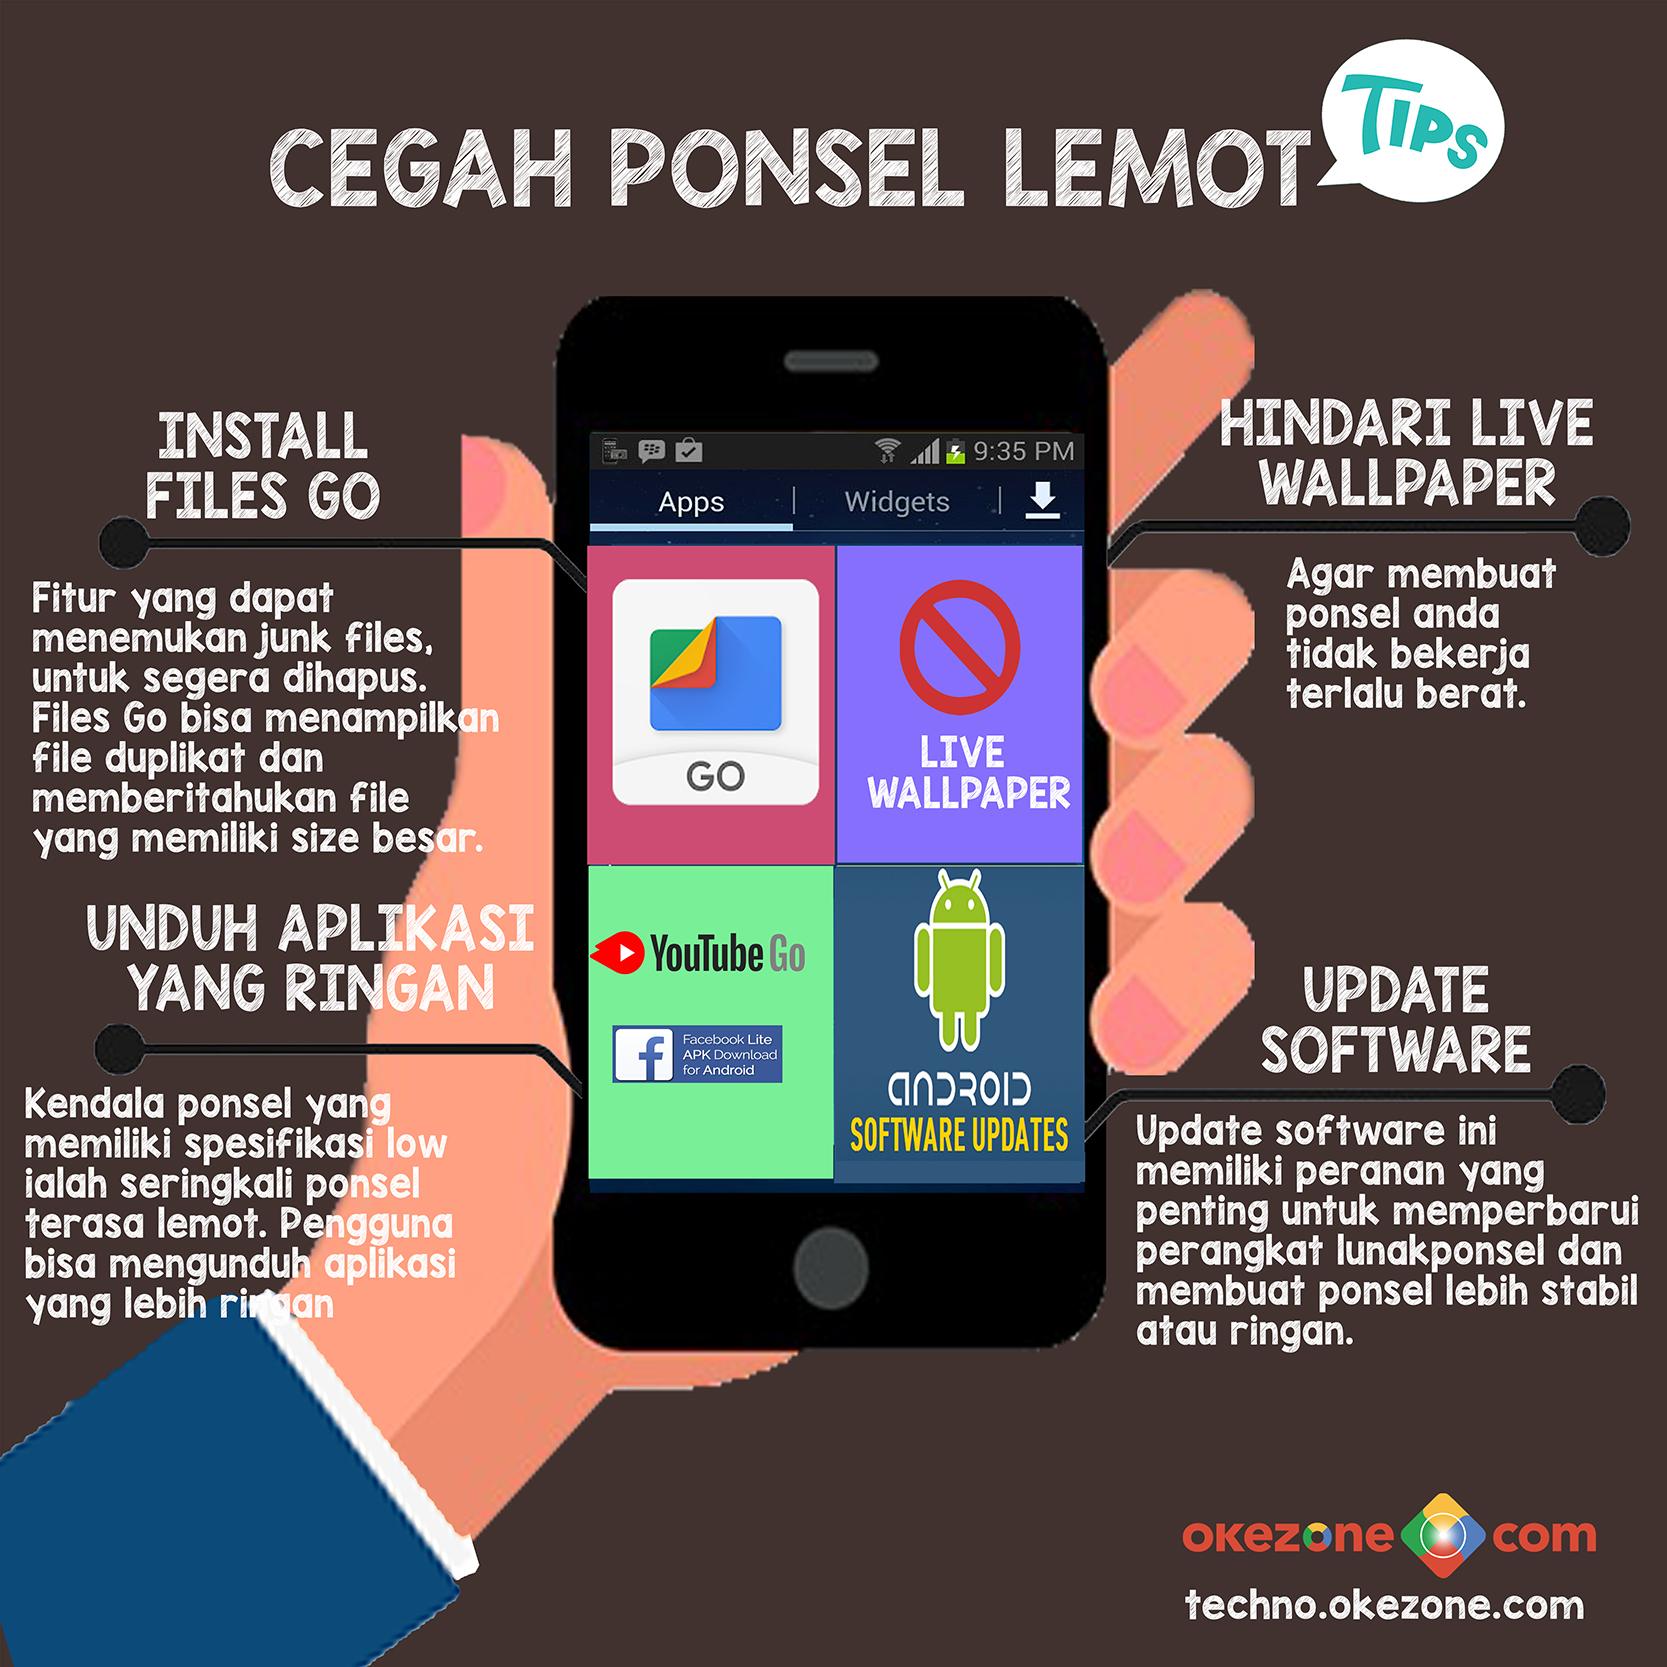 TIPS CEGAH PONSEL LEMOT -